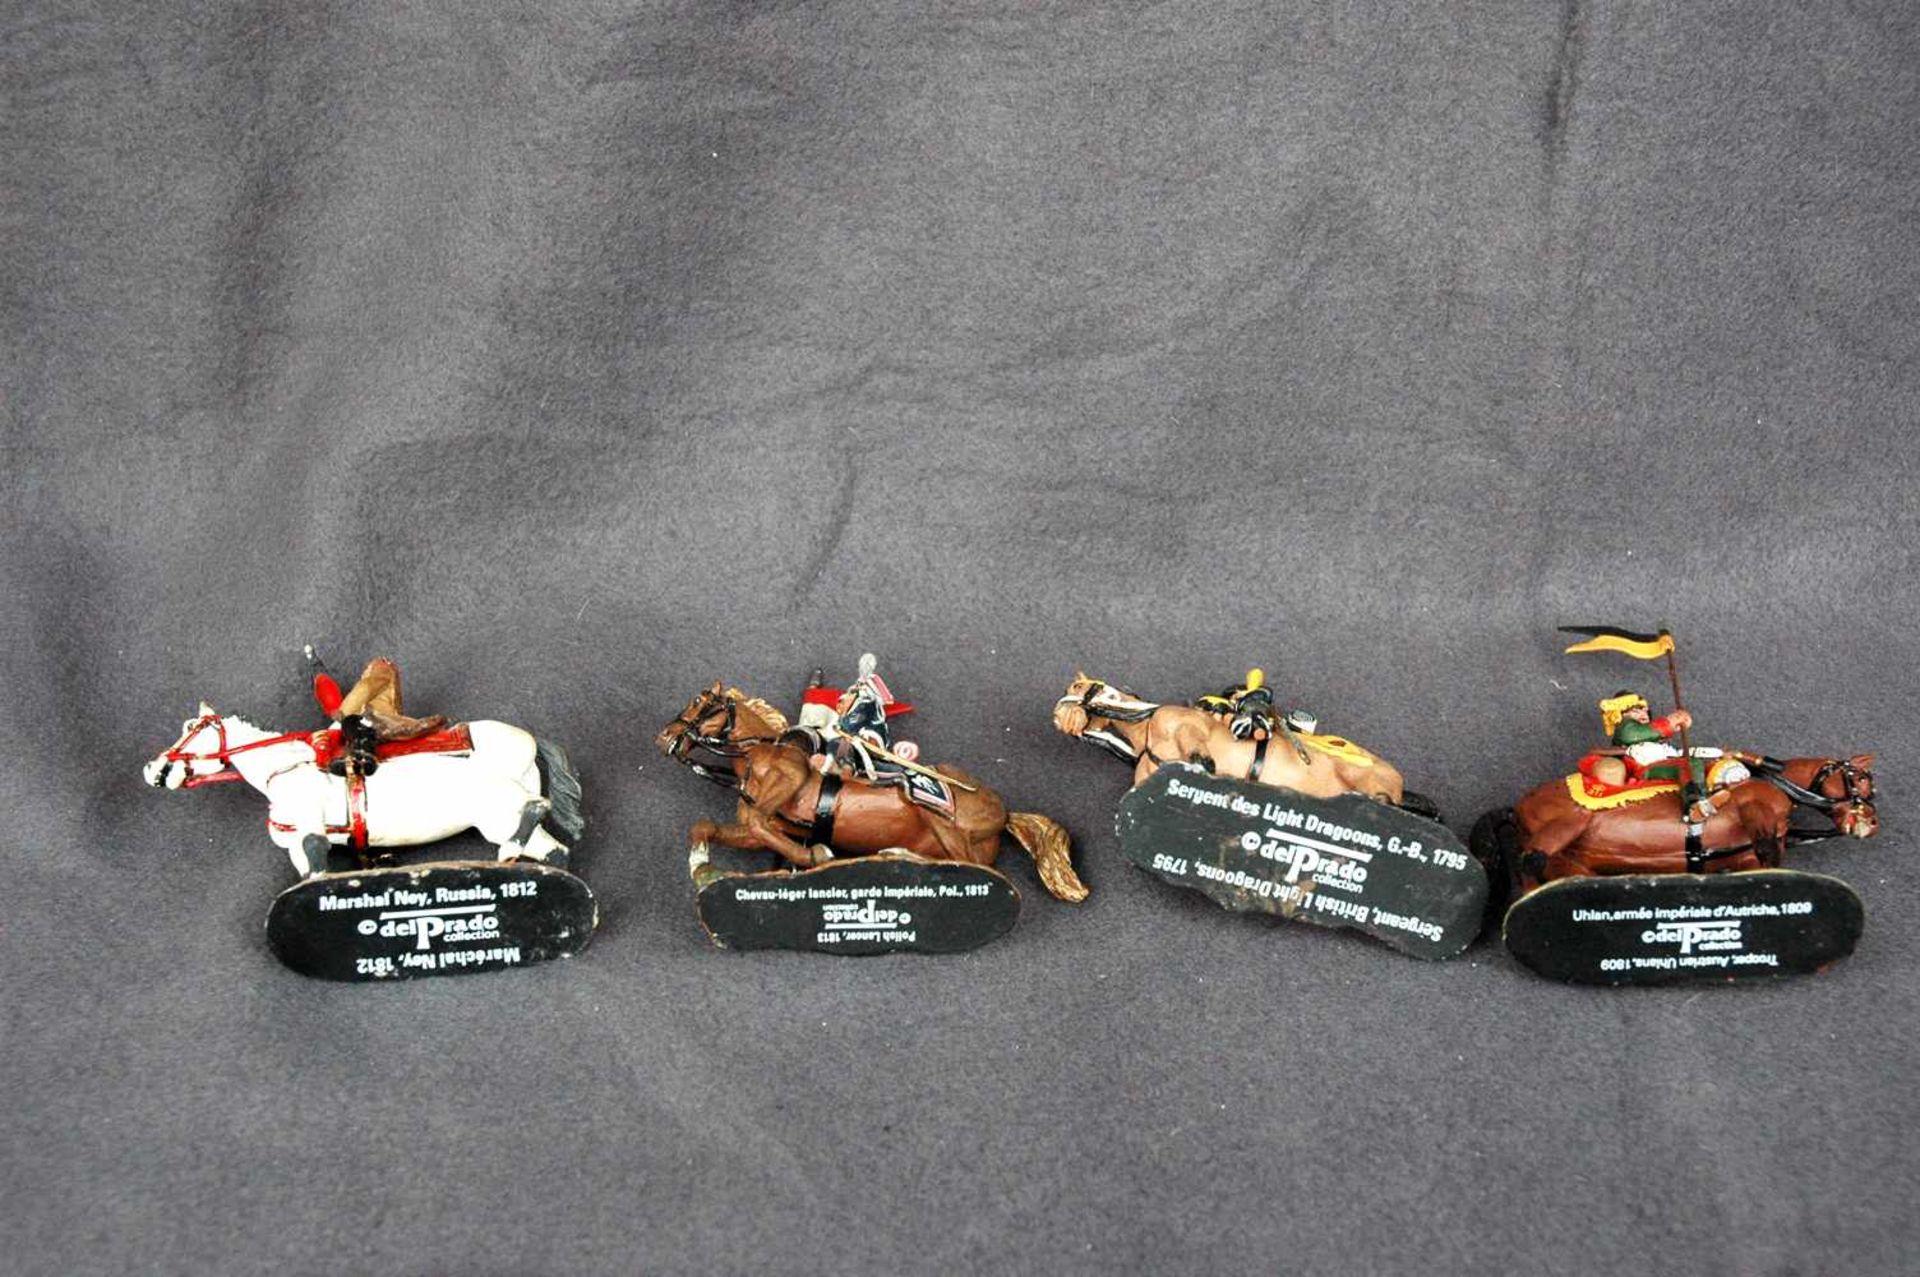 Zinn-Sammelfiguren, delprado: 66 Kavallerie-Figuren, Napoleonische Kriege - Bild 4 aus 4